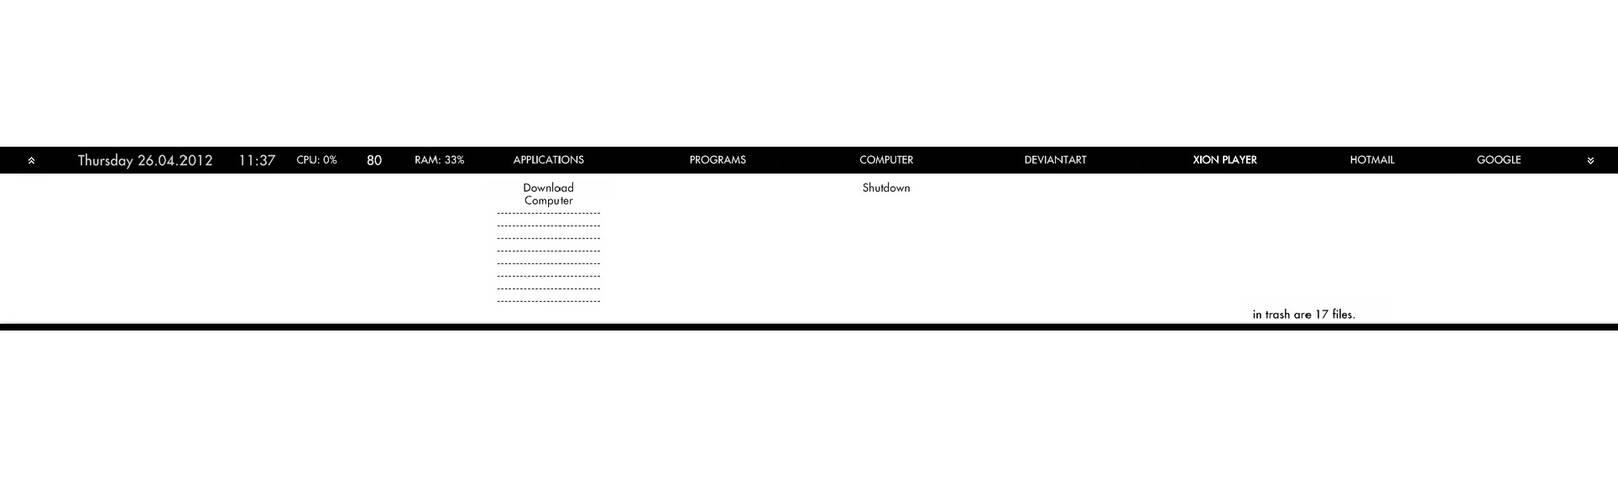 my rainmeter taskbar english version 26.04.2012